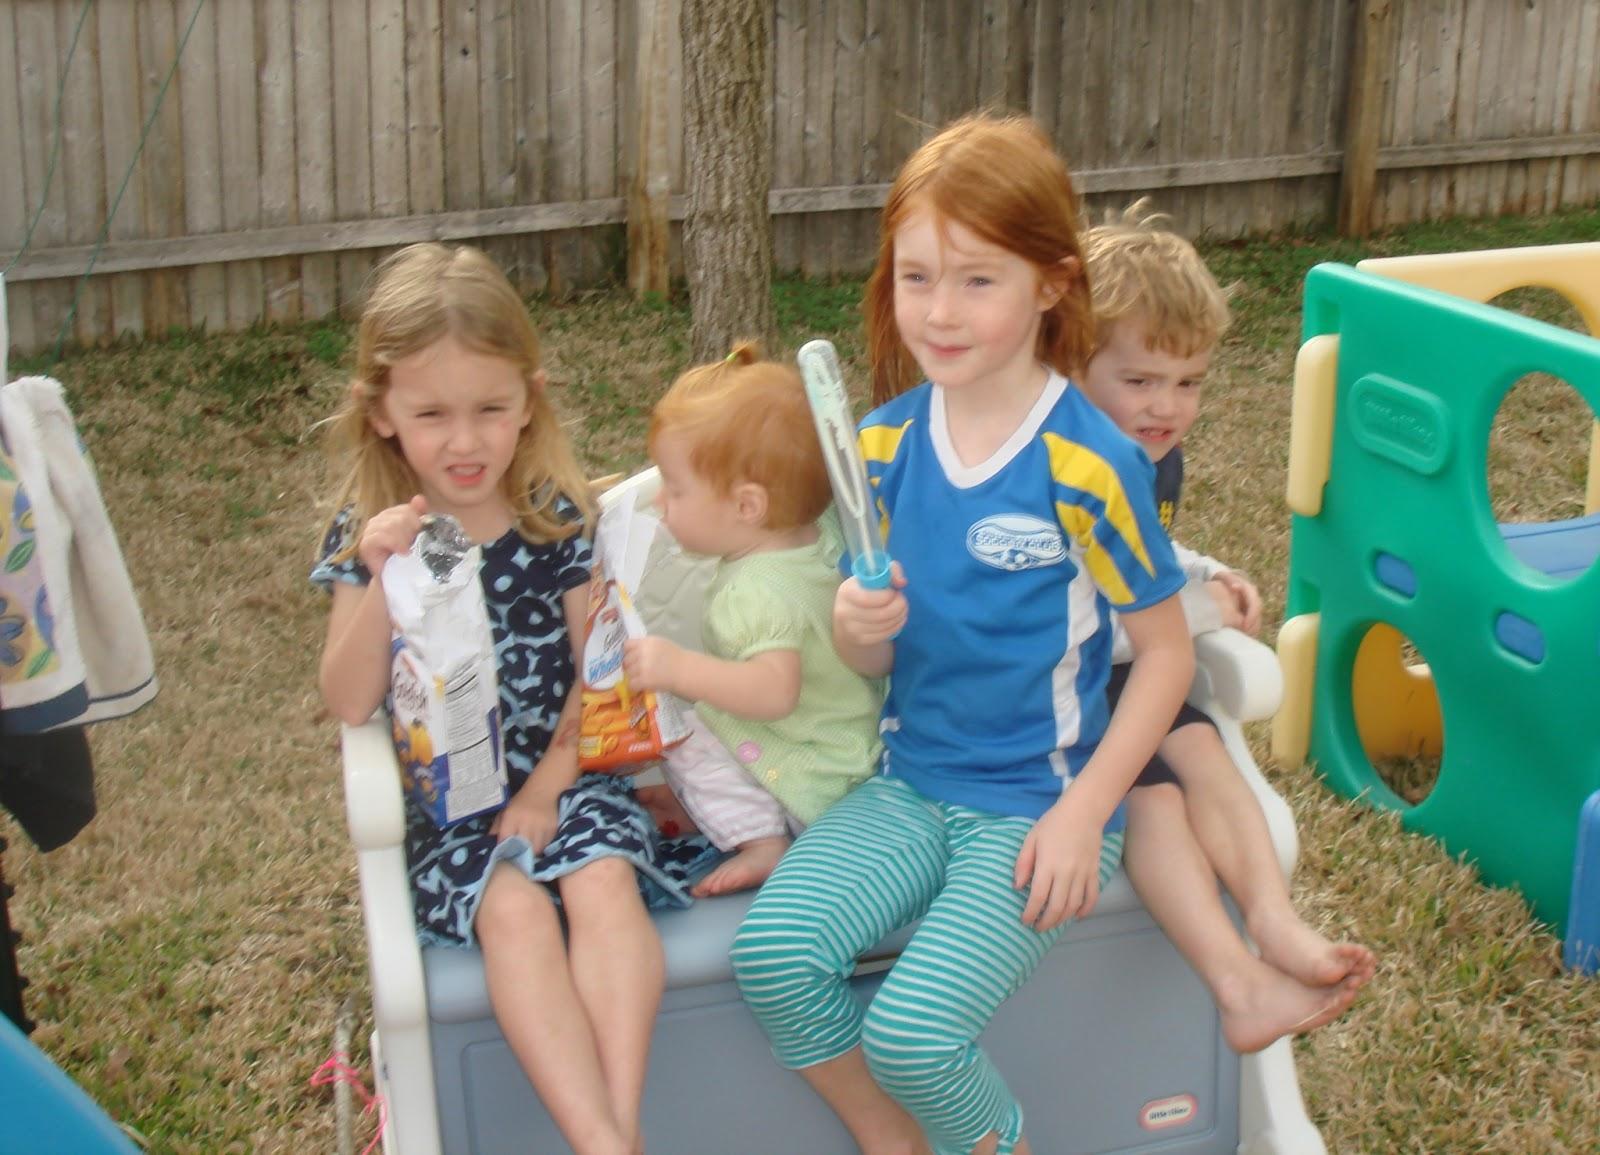 Our Family: Backyard fun